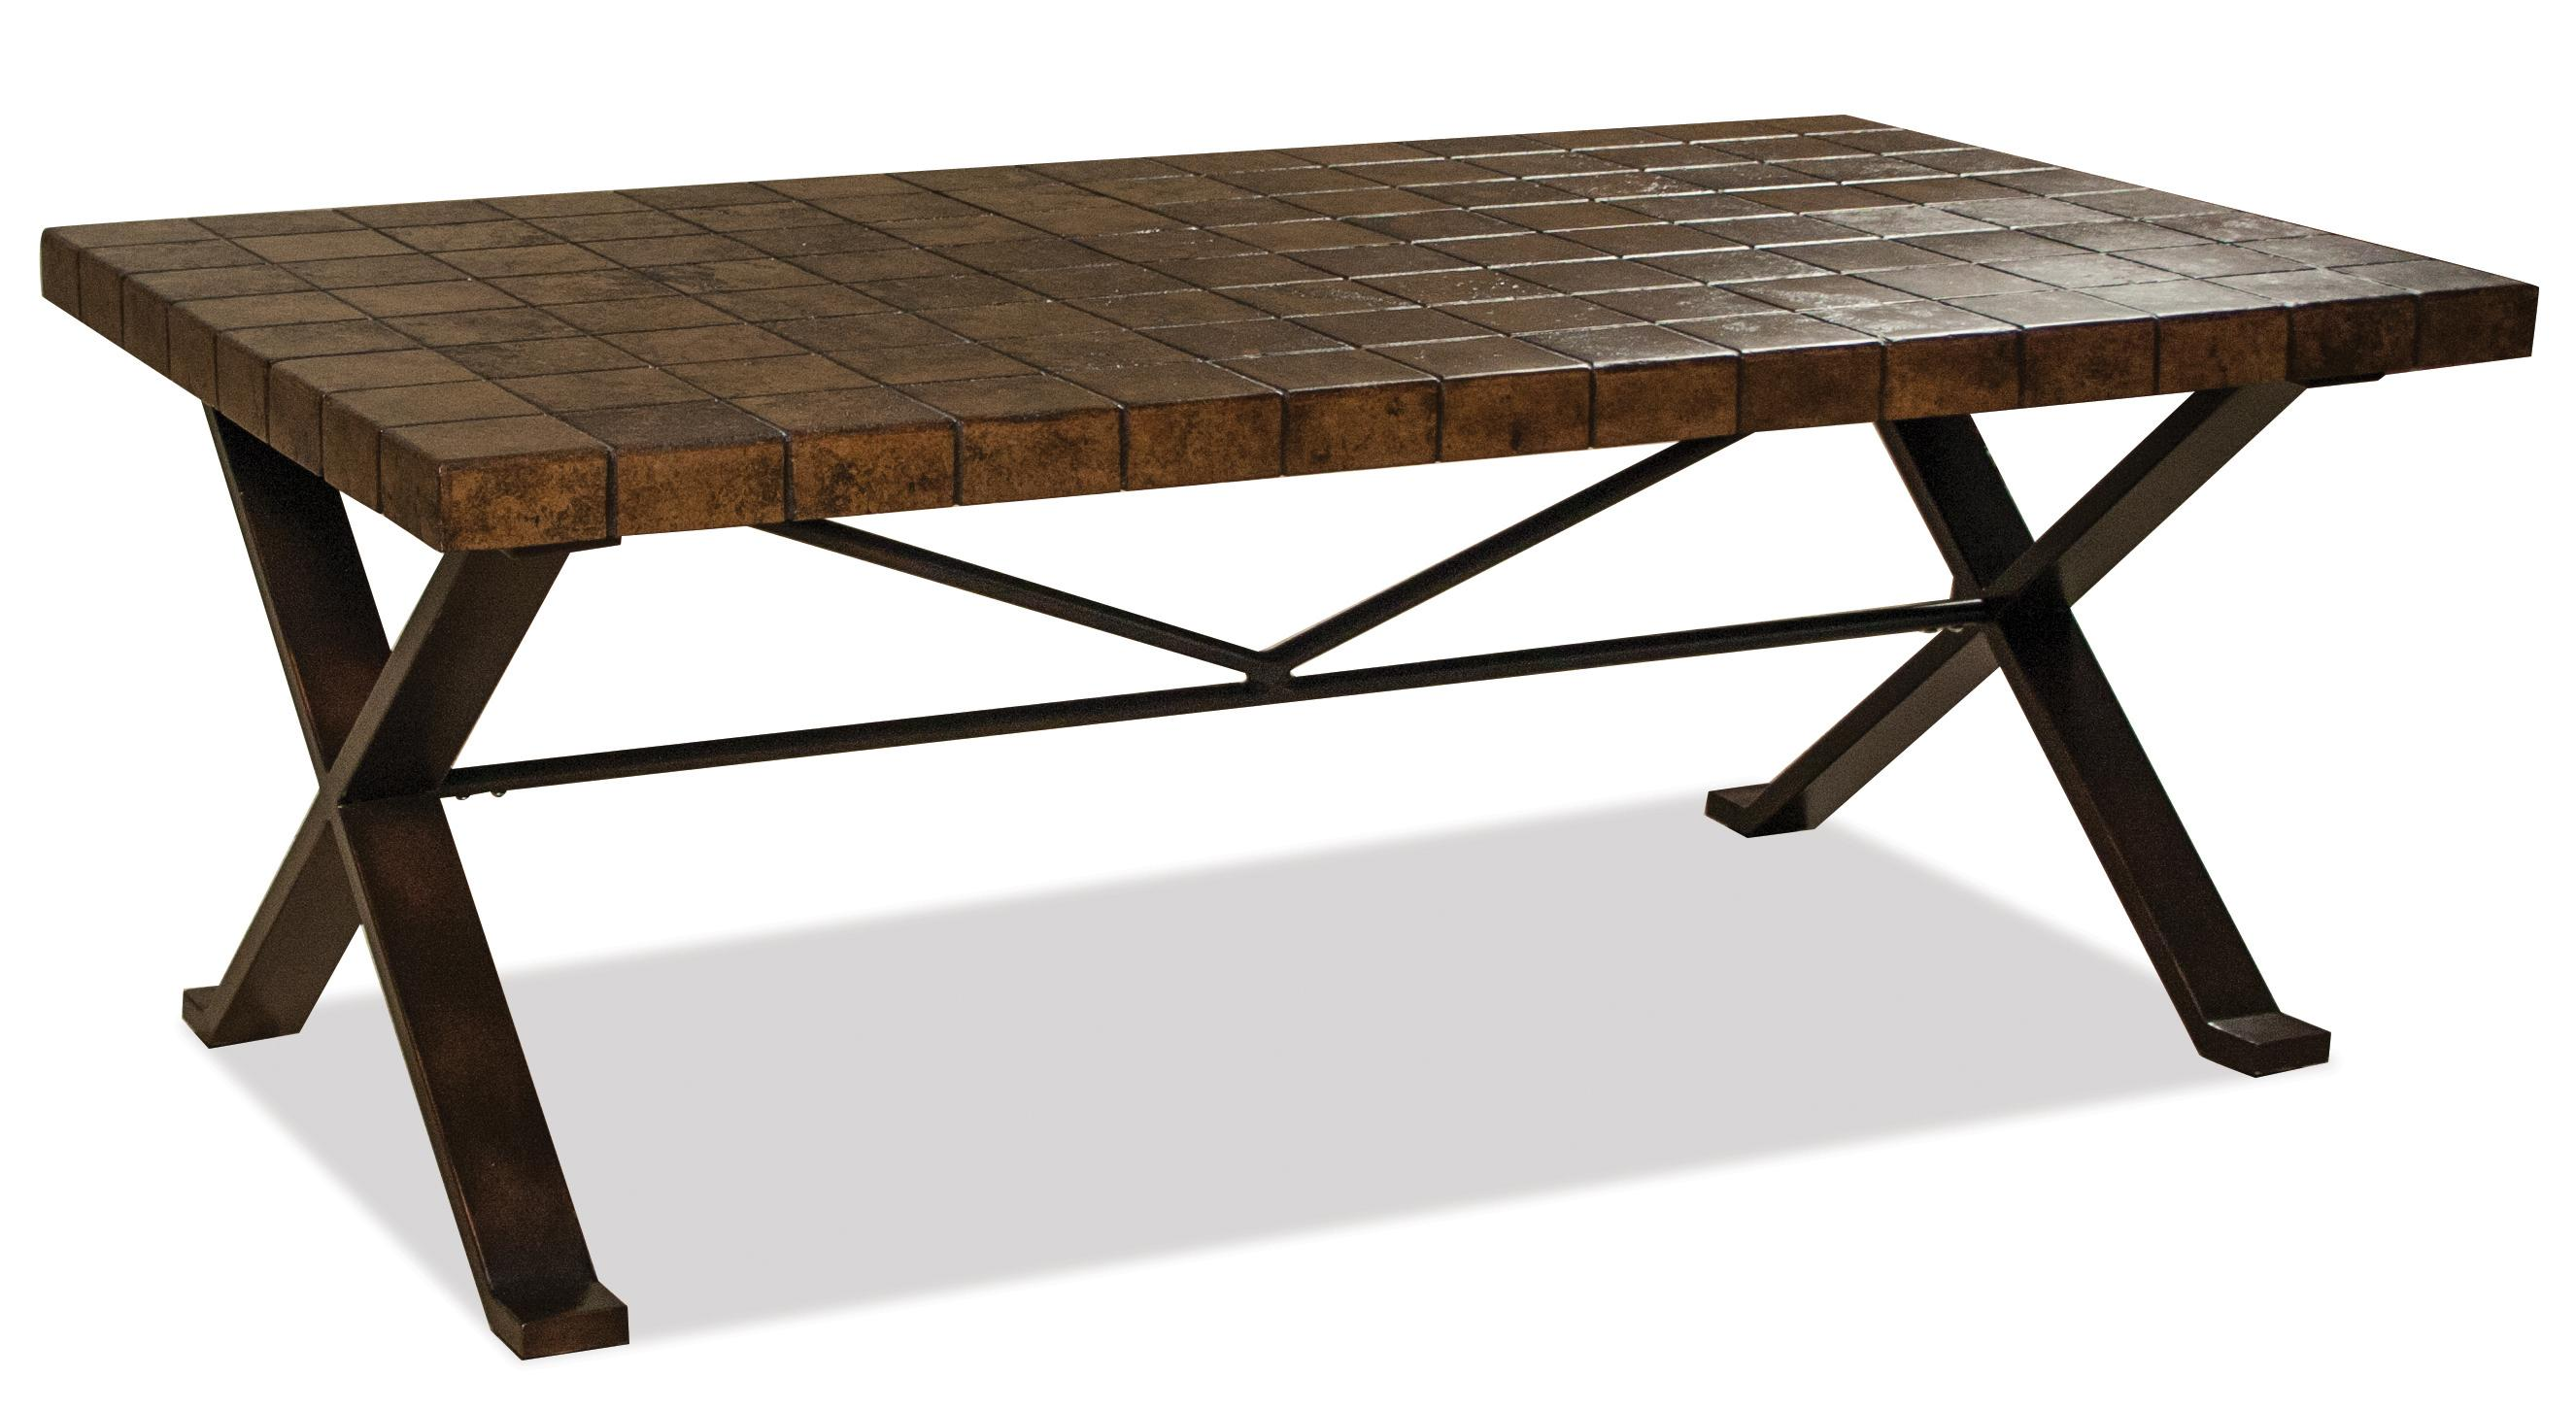 Riverside Furniture Bolero Cocktail Table             - Item Number: 91802